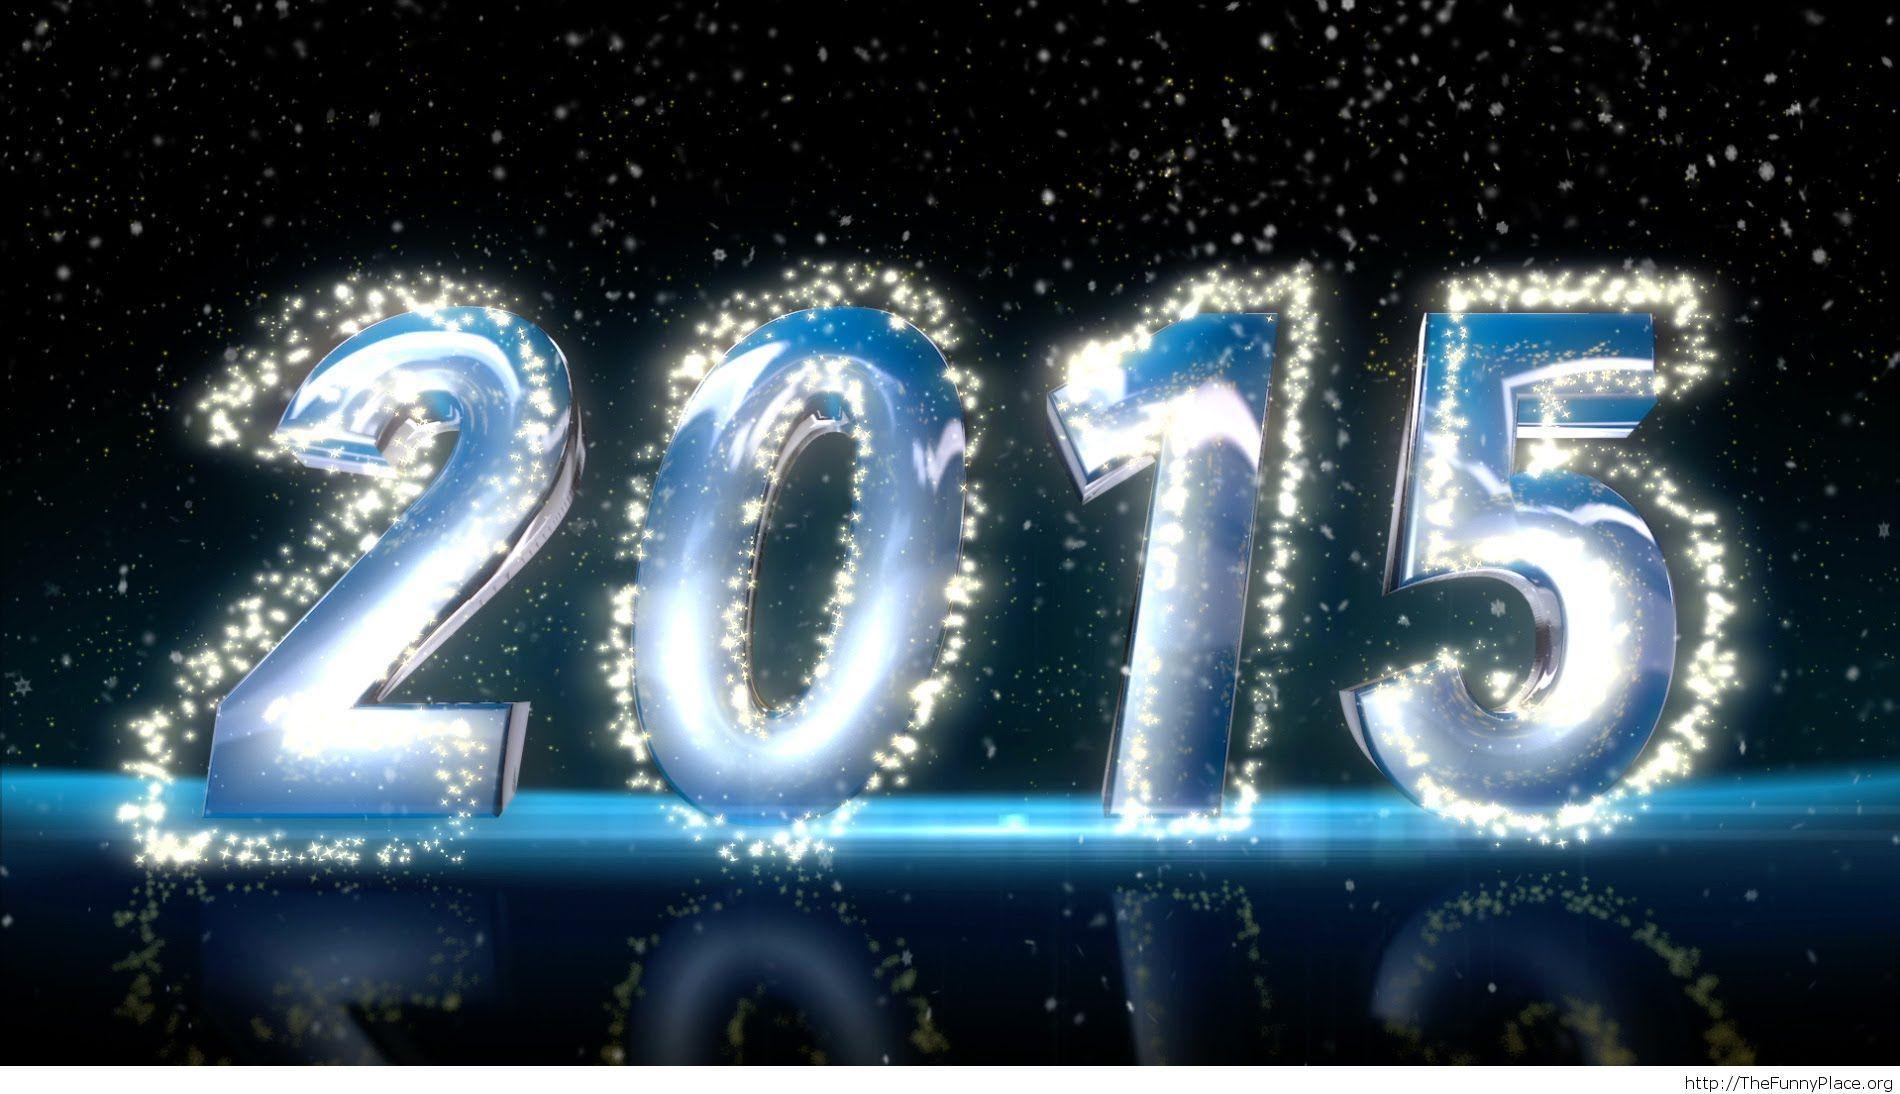 Fireworks 2015 cool text wallpaper